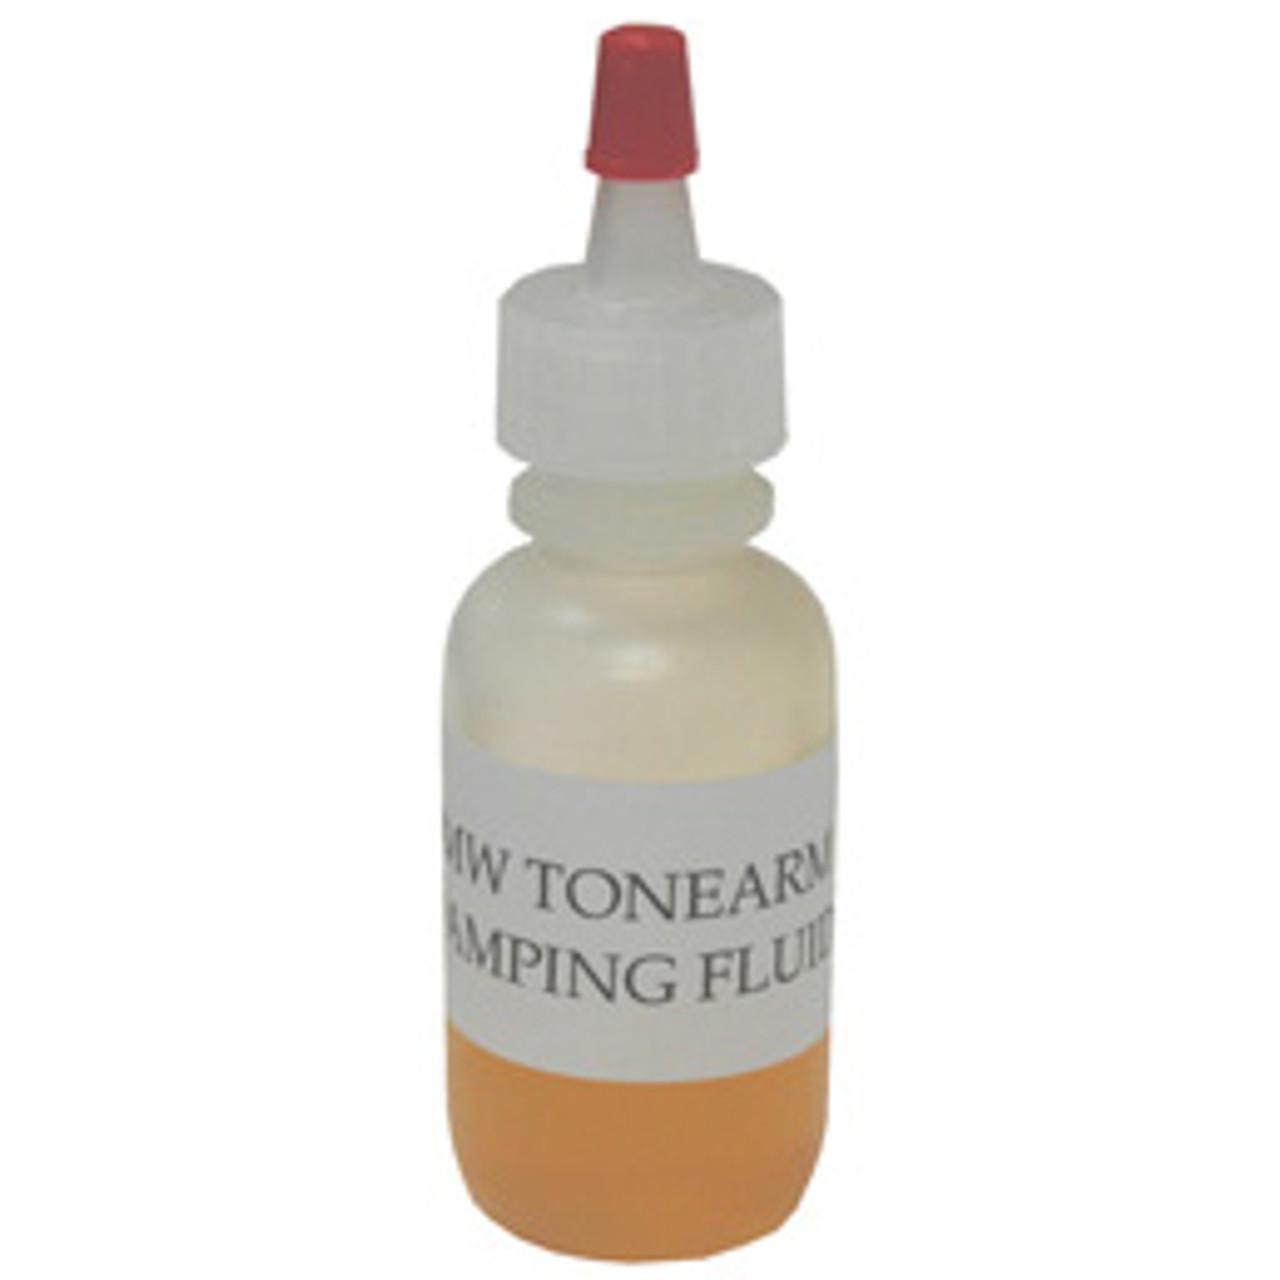 VPI tonearm damping fluid